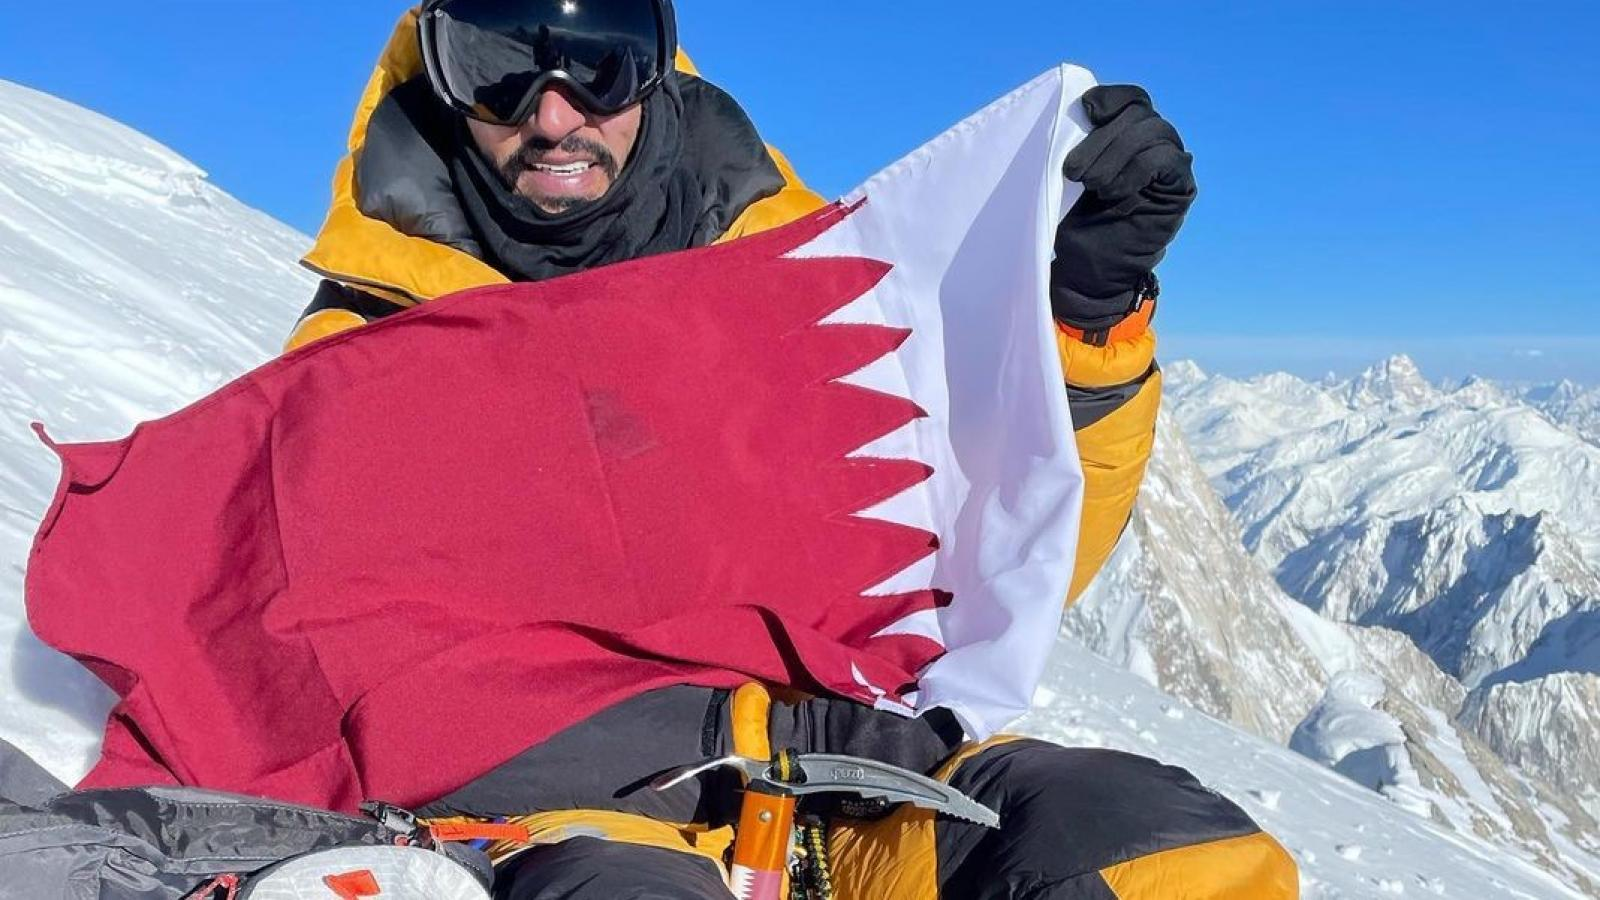 Qatari climber Fahad Badar achieves yet another mountain climbing feat